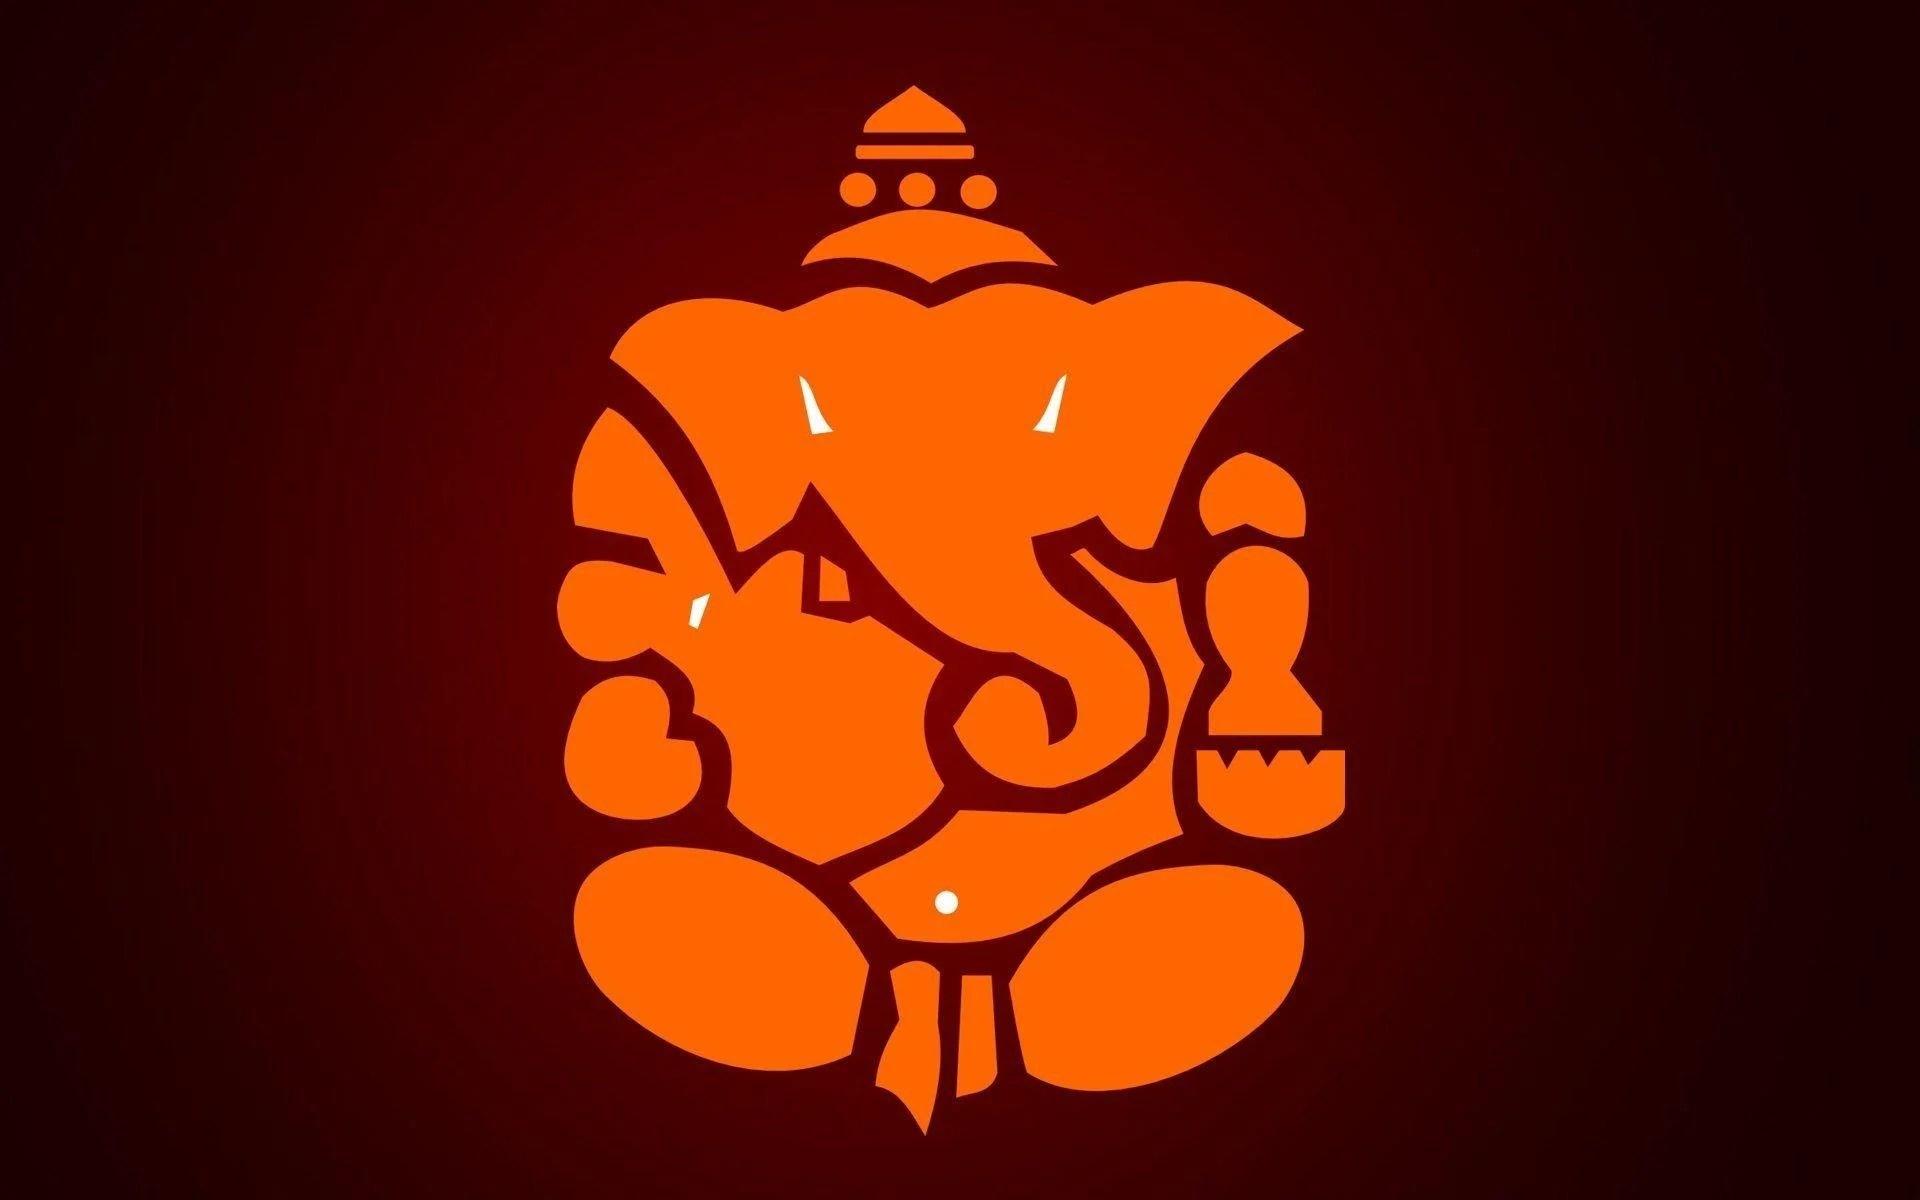 Sai Baba Animated Wallpapers Free Download Ganpati Wallpapers Wallpaper Cave